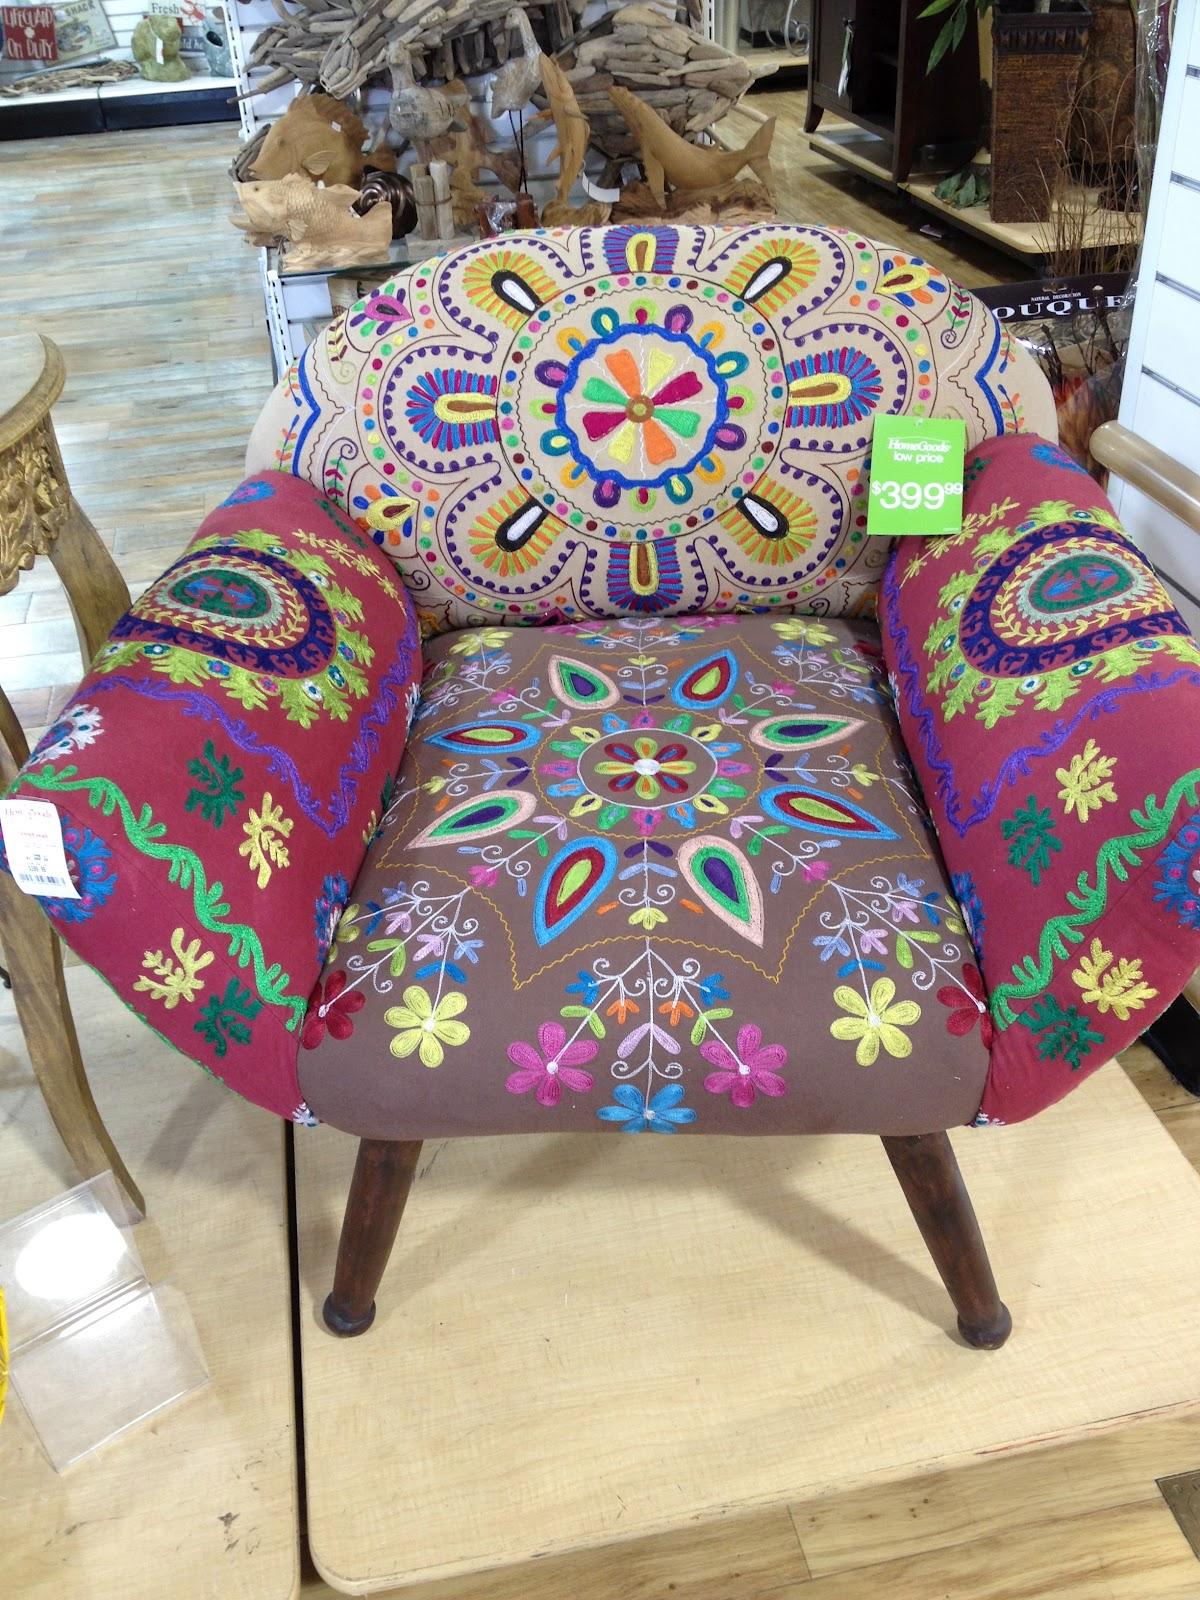 The Indian Bazaar Is At Tjma Homegoods, Home Goods Chair Pillows